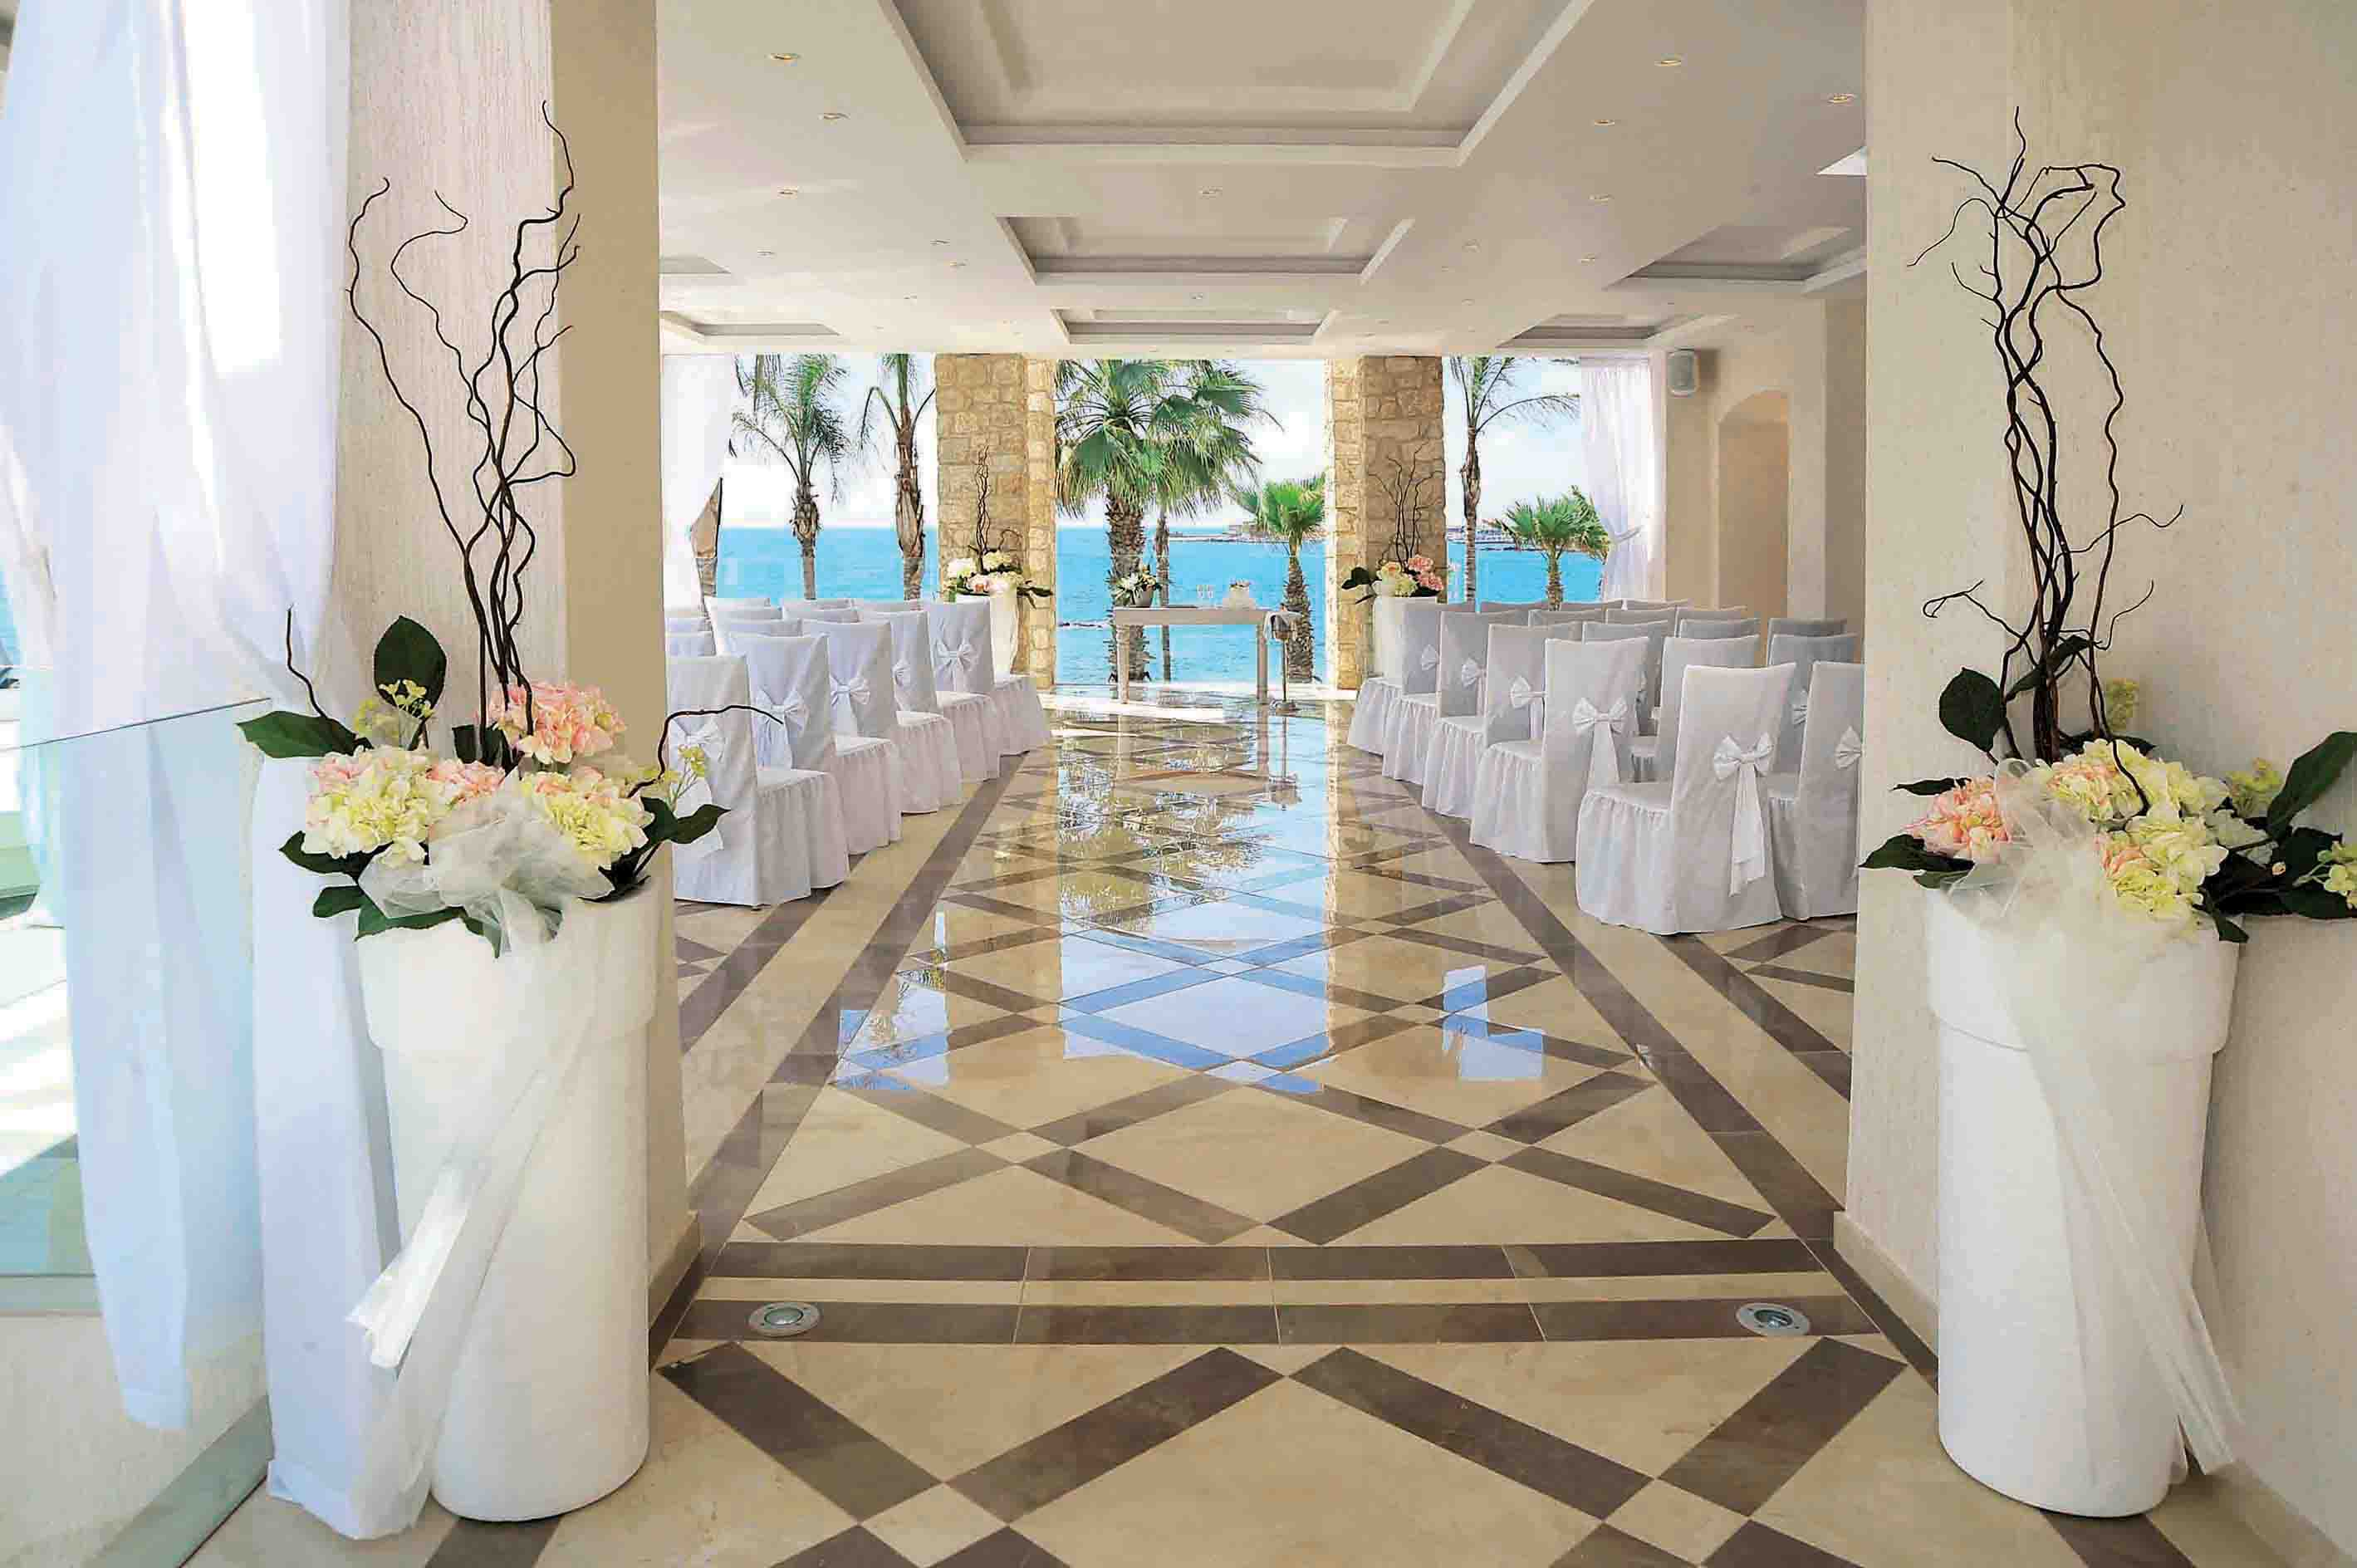 St Jude Heritage >> Paphos Wedding Venues – Jude Blackmore Cyprus Weddings LTD